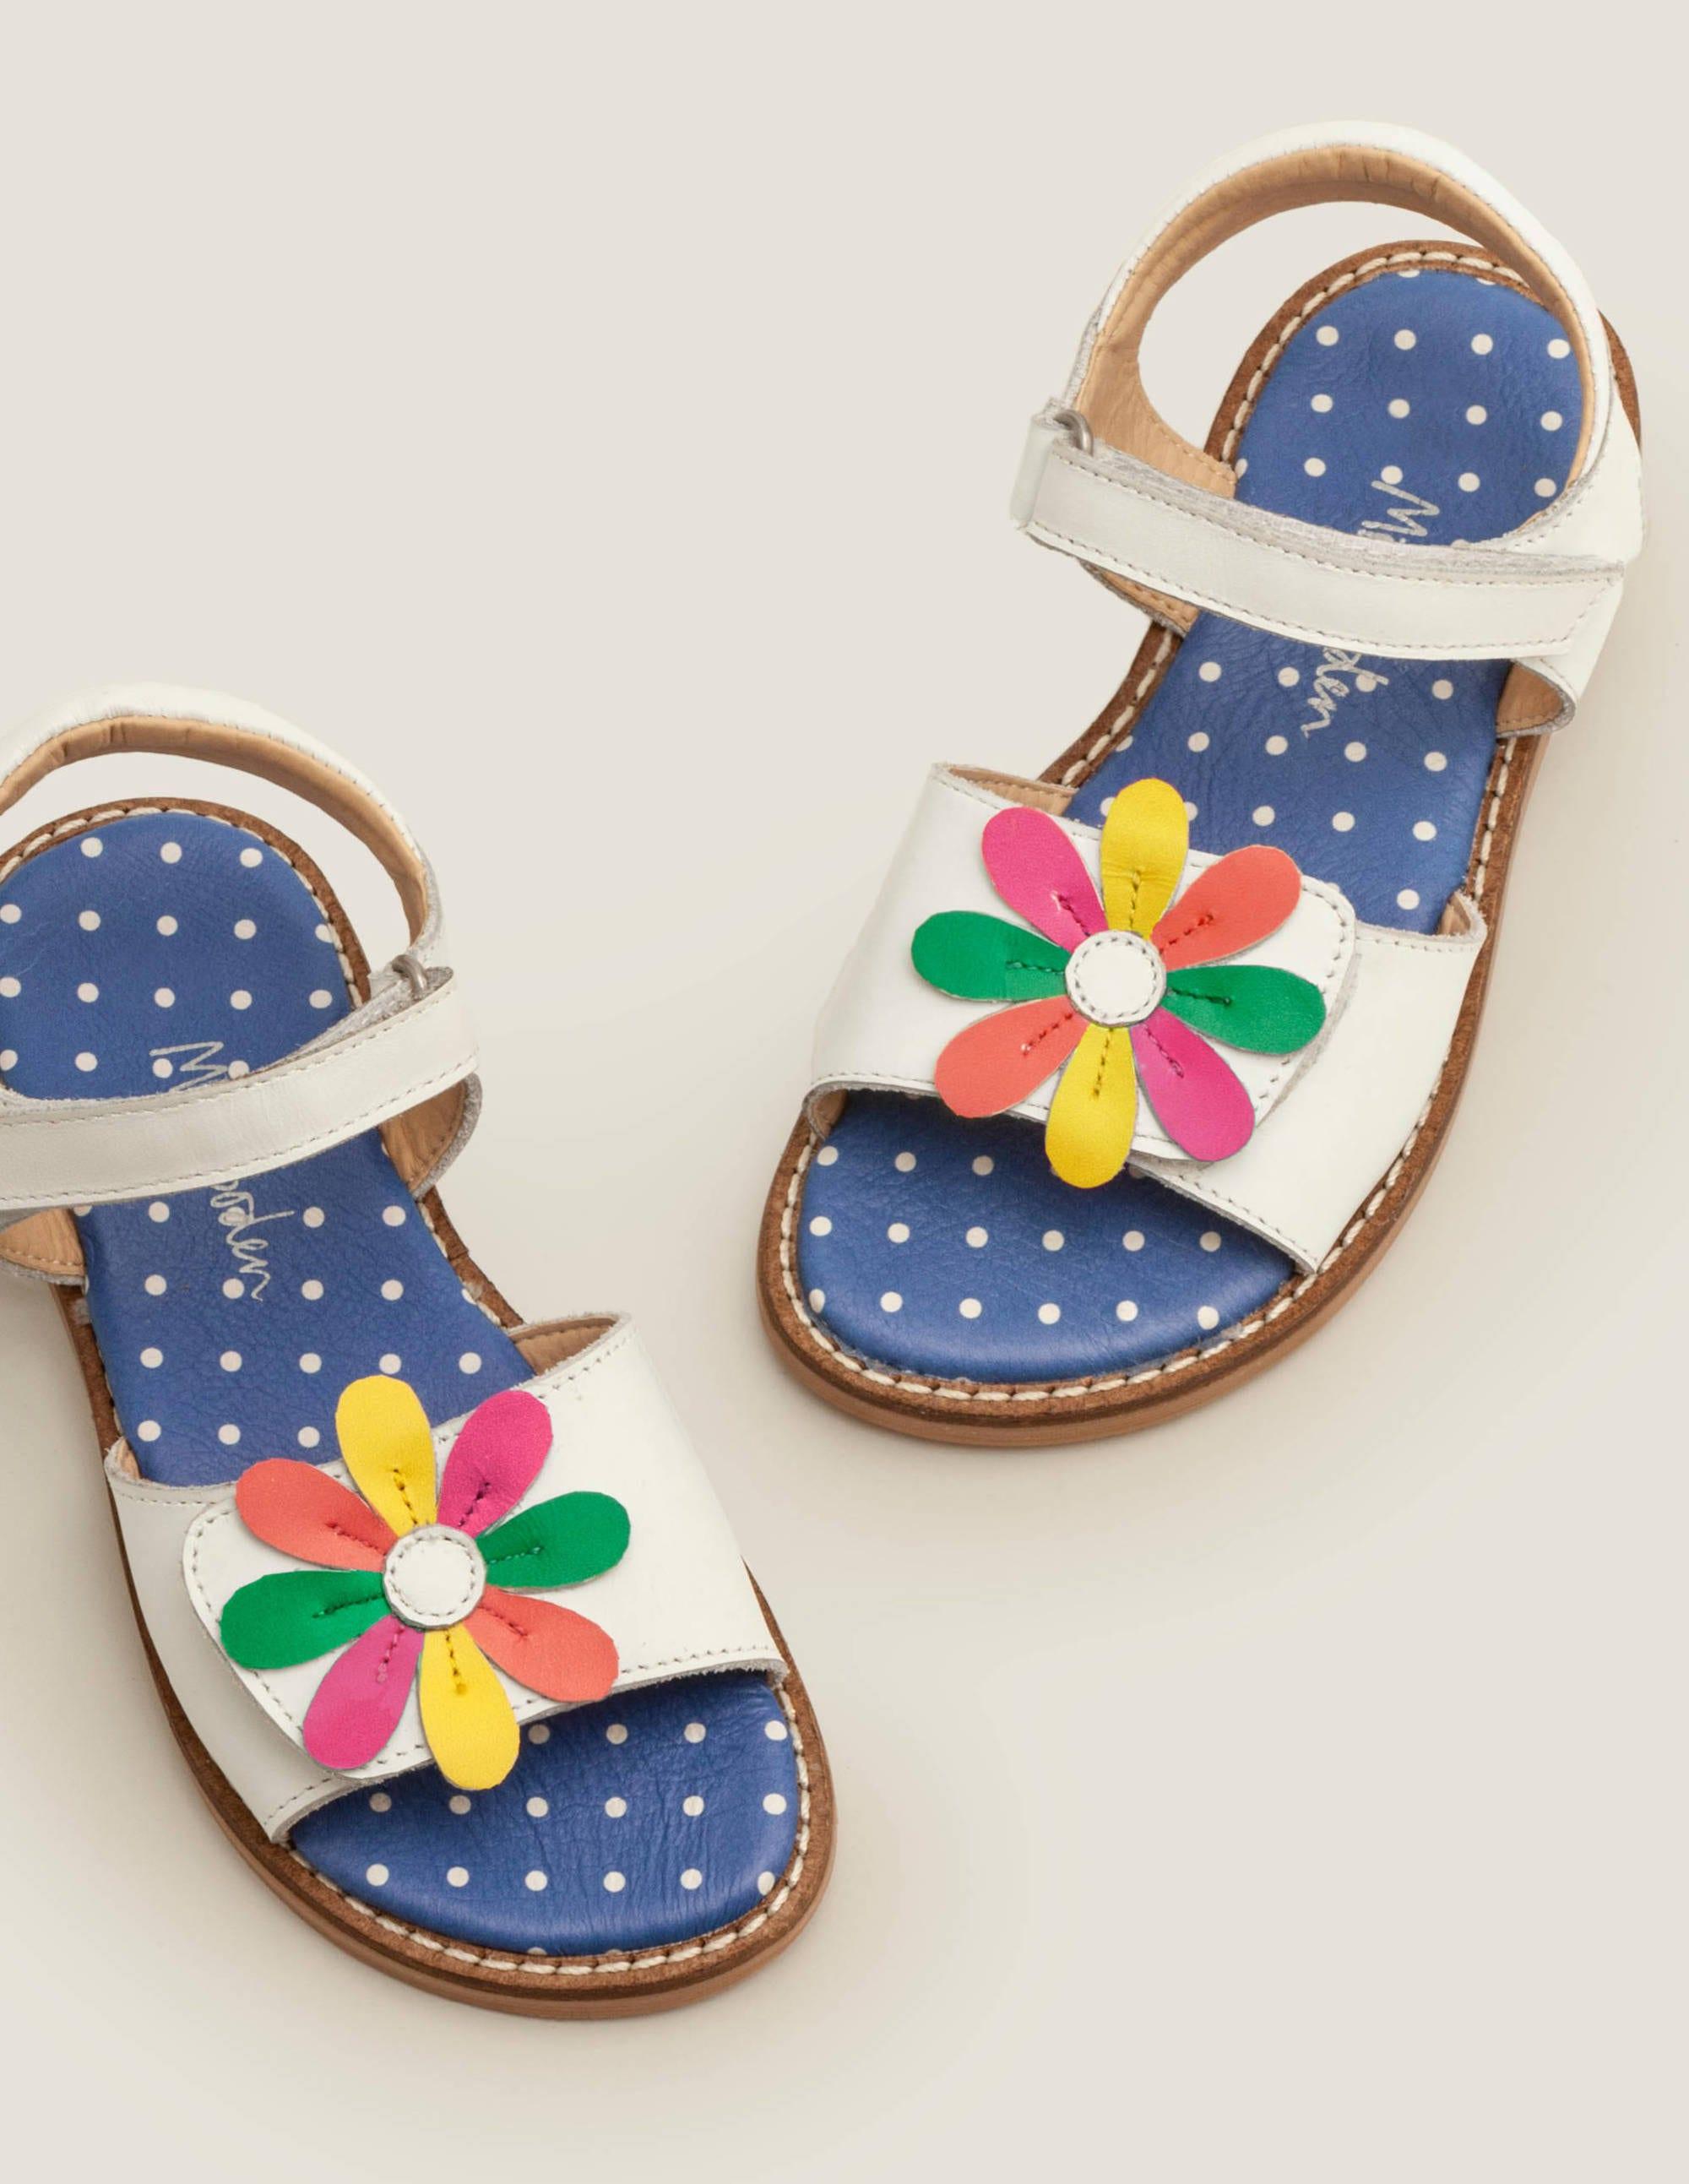 Leather Padded Sandals - Multi Glitter